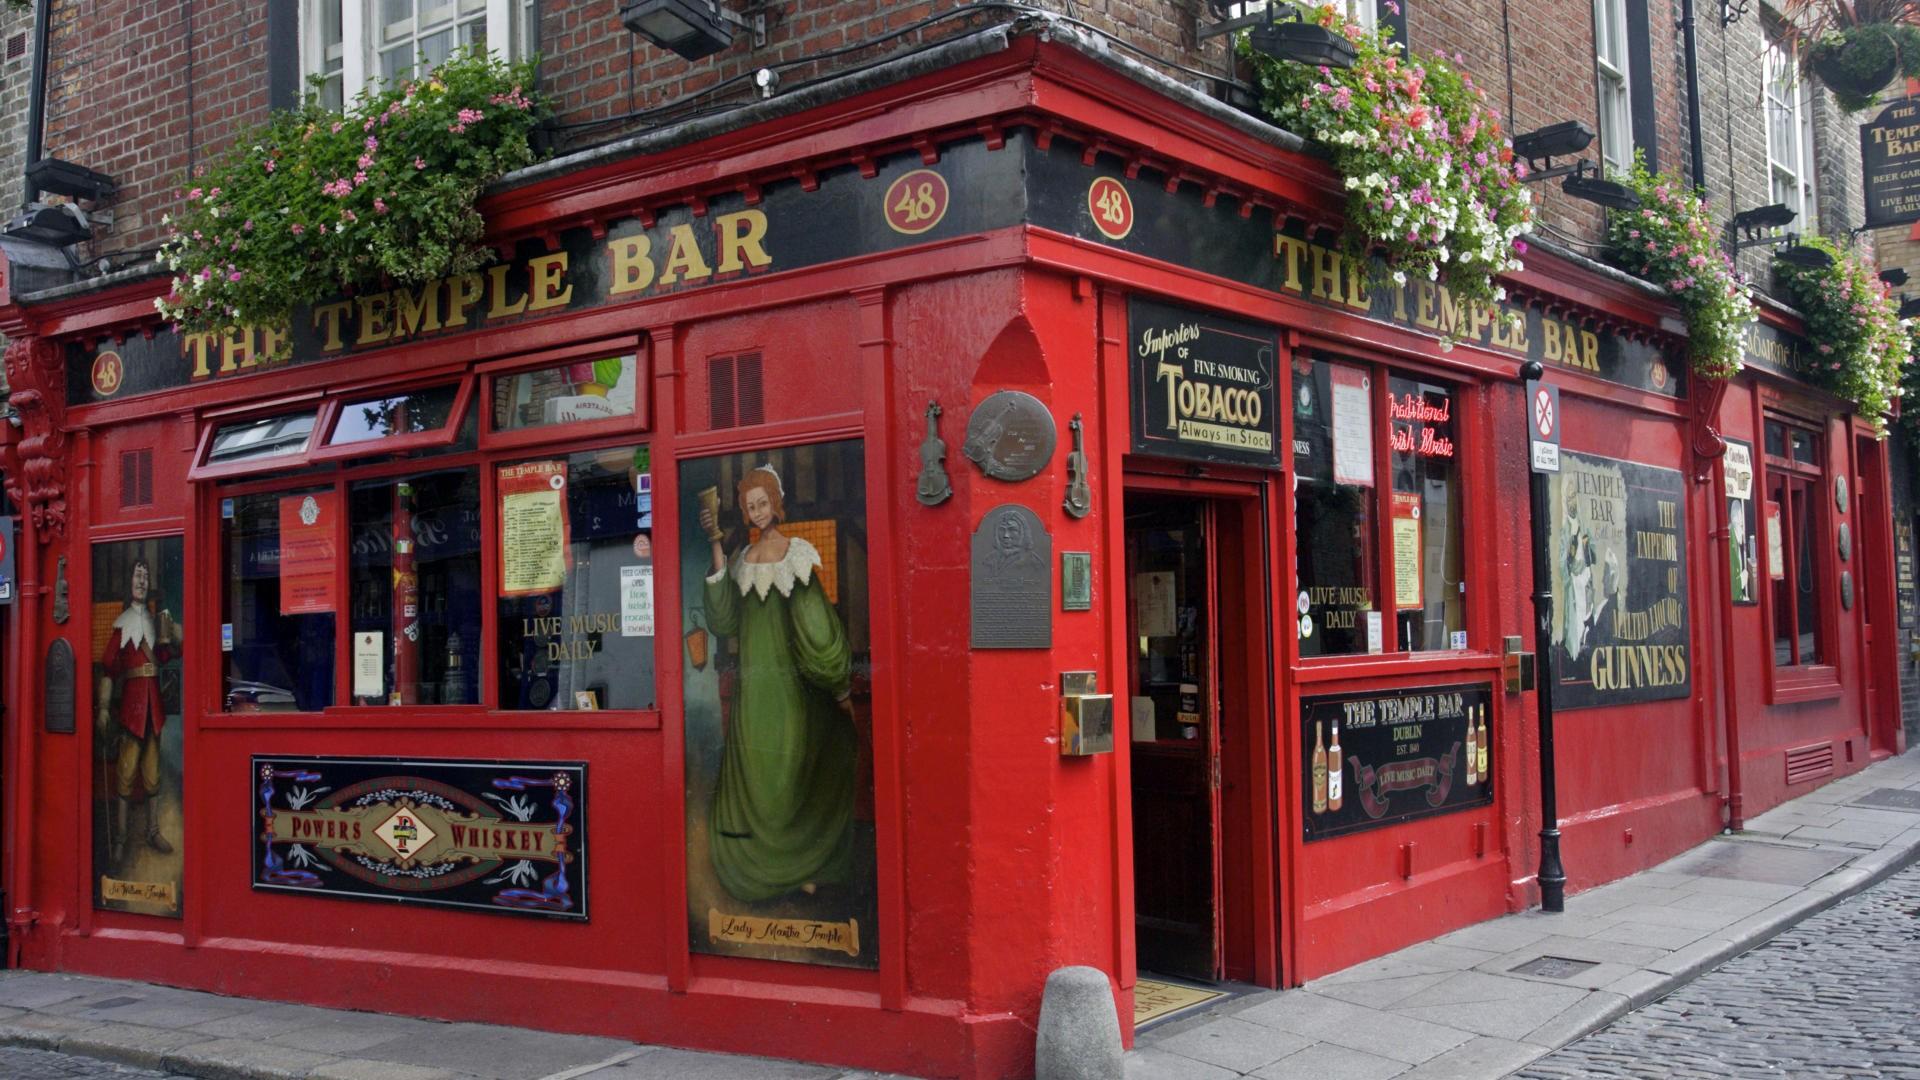 Man Made   Building Dublin Ireland Pub Wallpaper 1920x1080